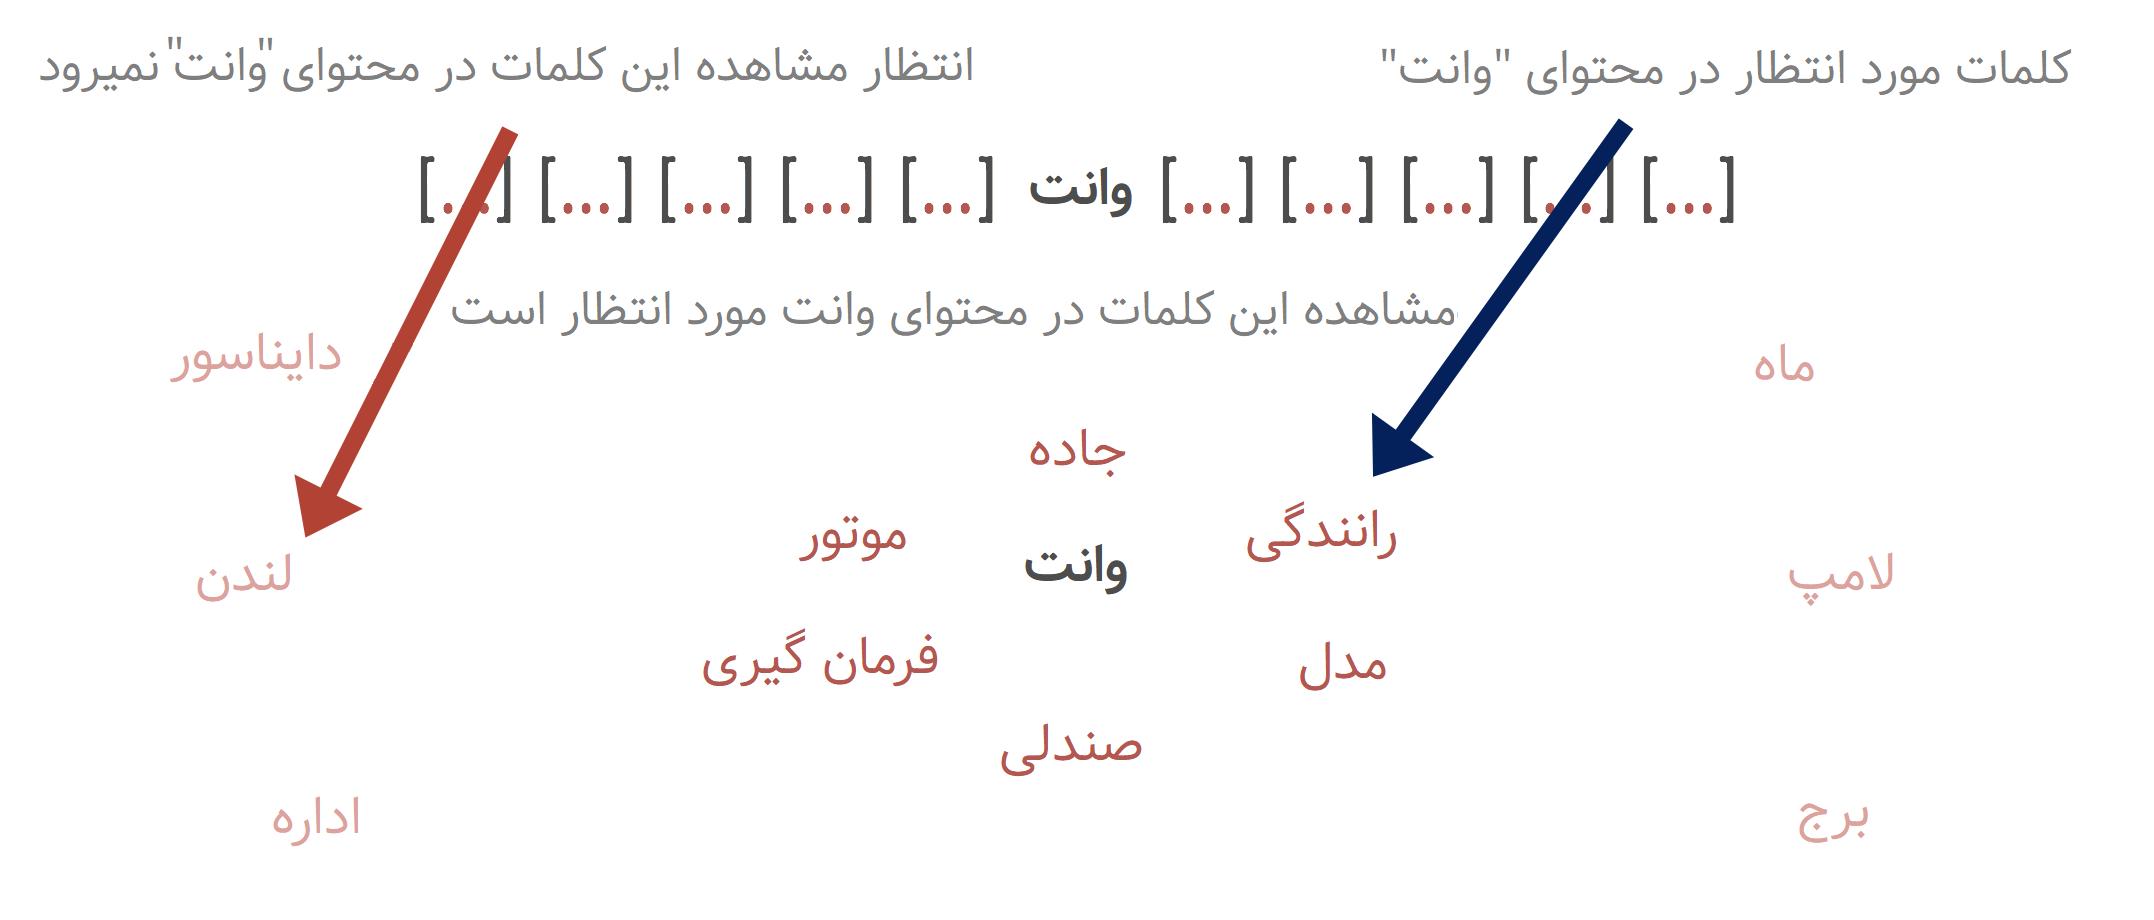 context-words-explanation-farsi